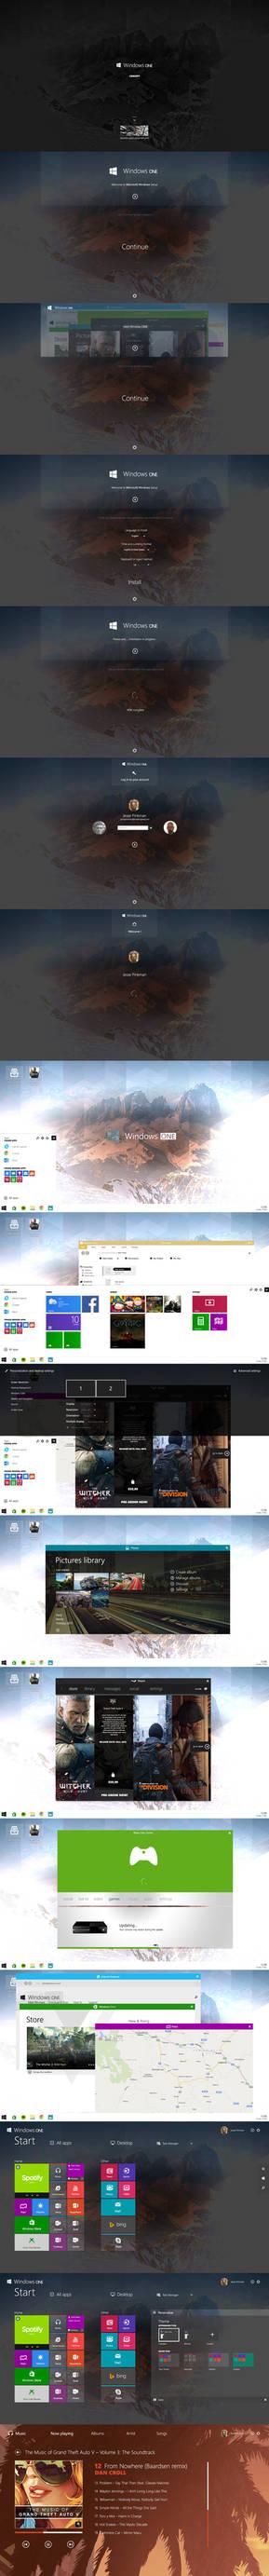 [NEW Concept] Windows ONE